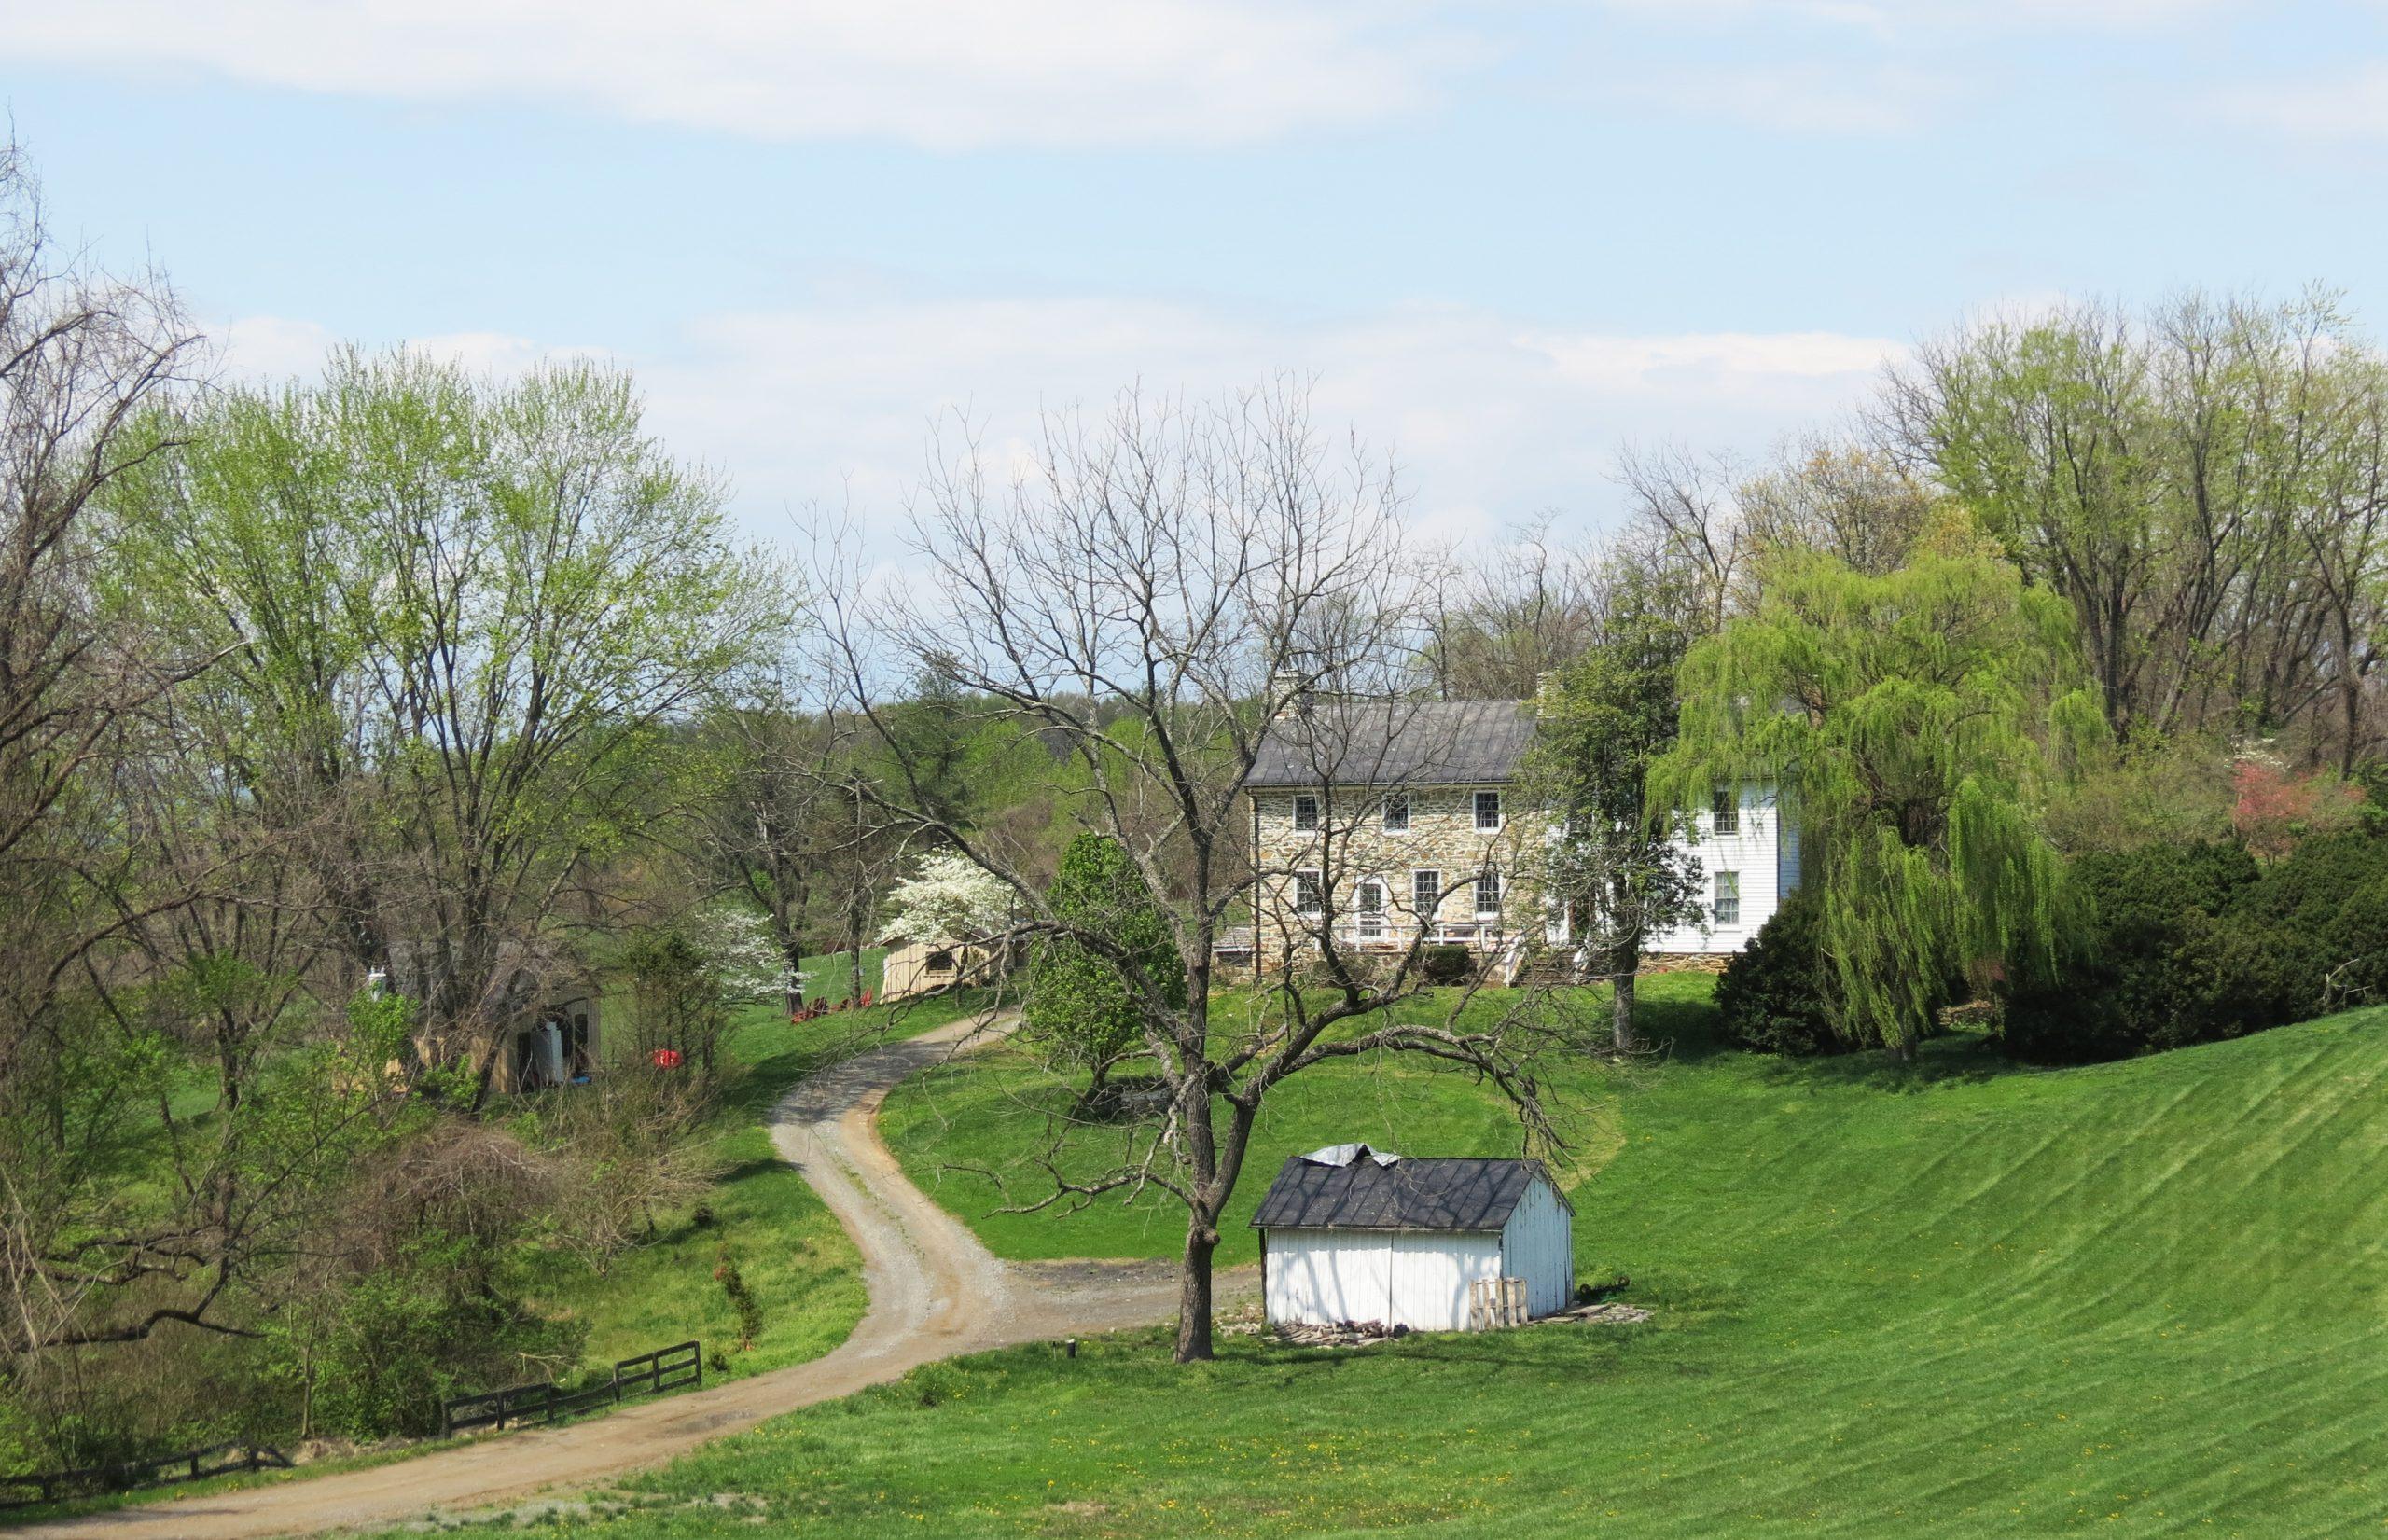 Goose Creek Rural Historic District